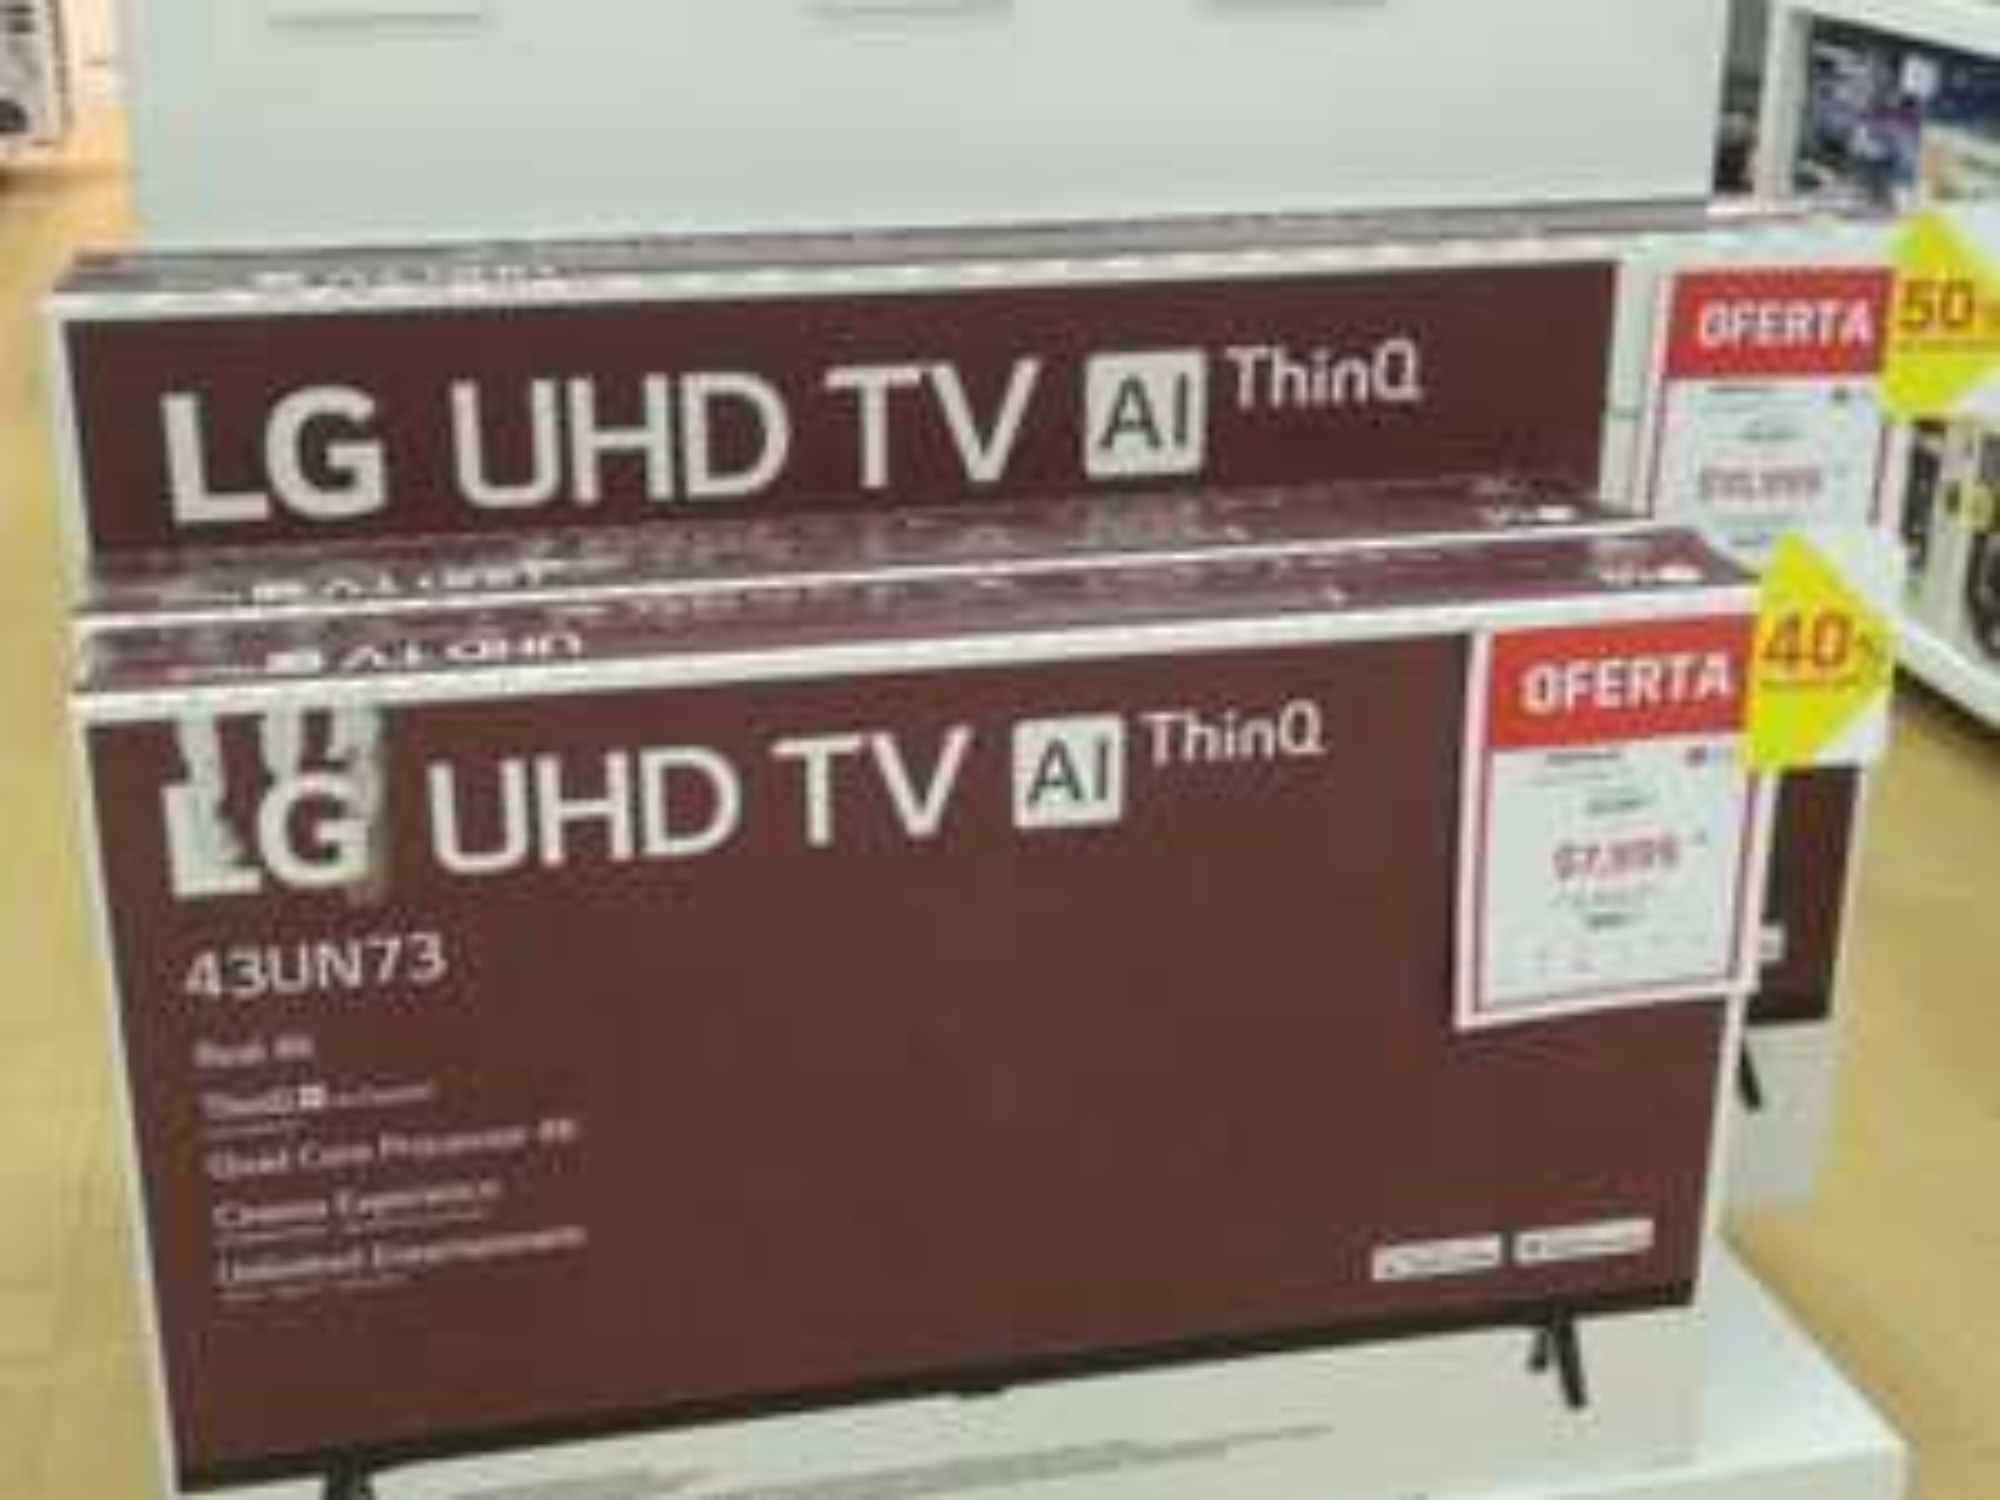 Suburbia: Pantalla LG 55 pulgadas UHD TV AI ThinQ 55UN7300PUC más bocina LG PL5 DE REGALO